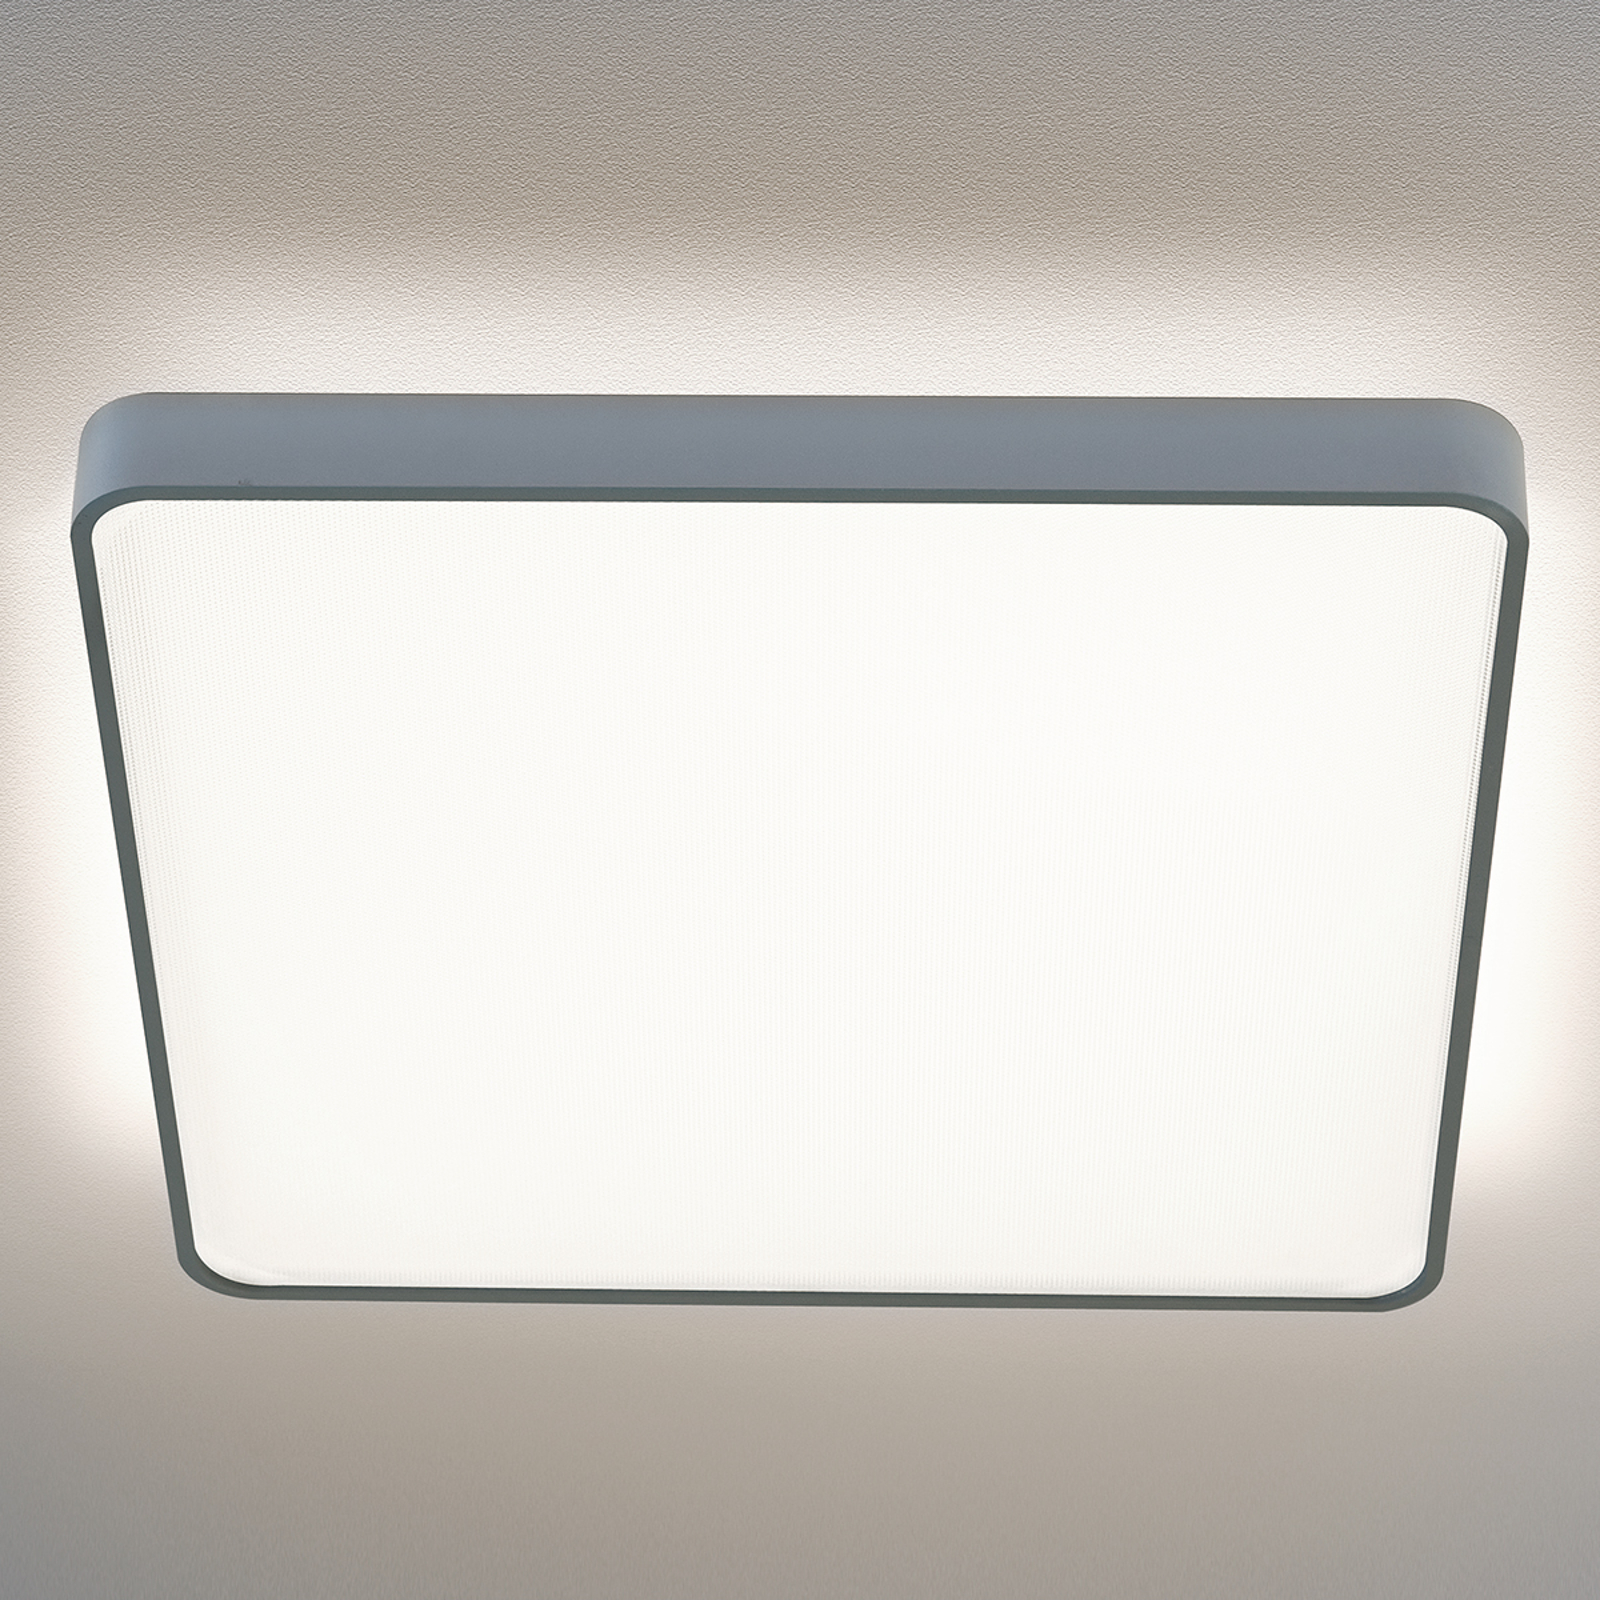 Kattovalaisin LED Caleo-X2 ww 91,4 cm